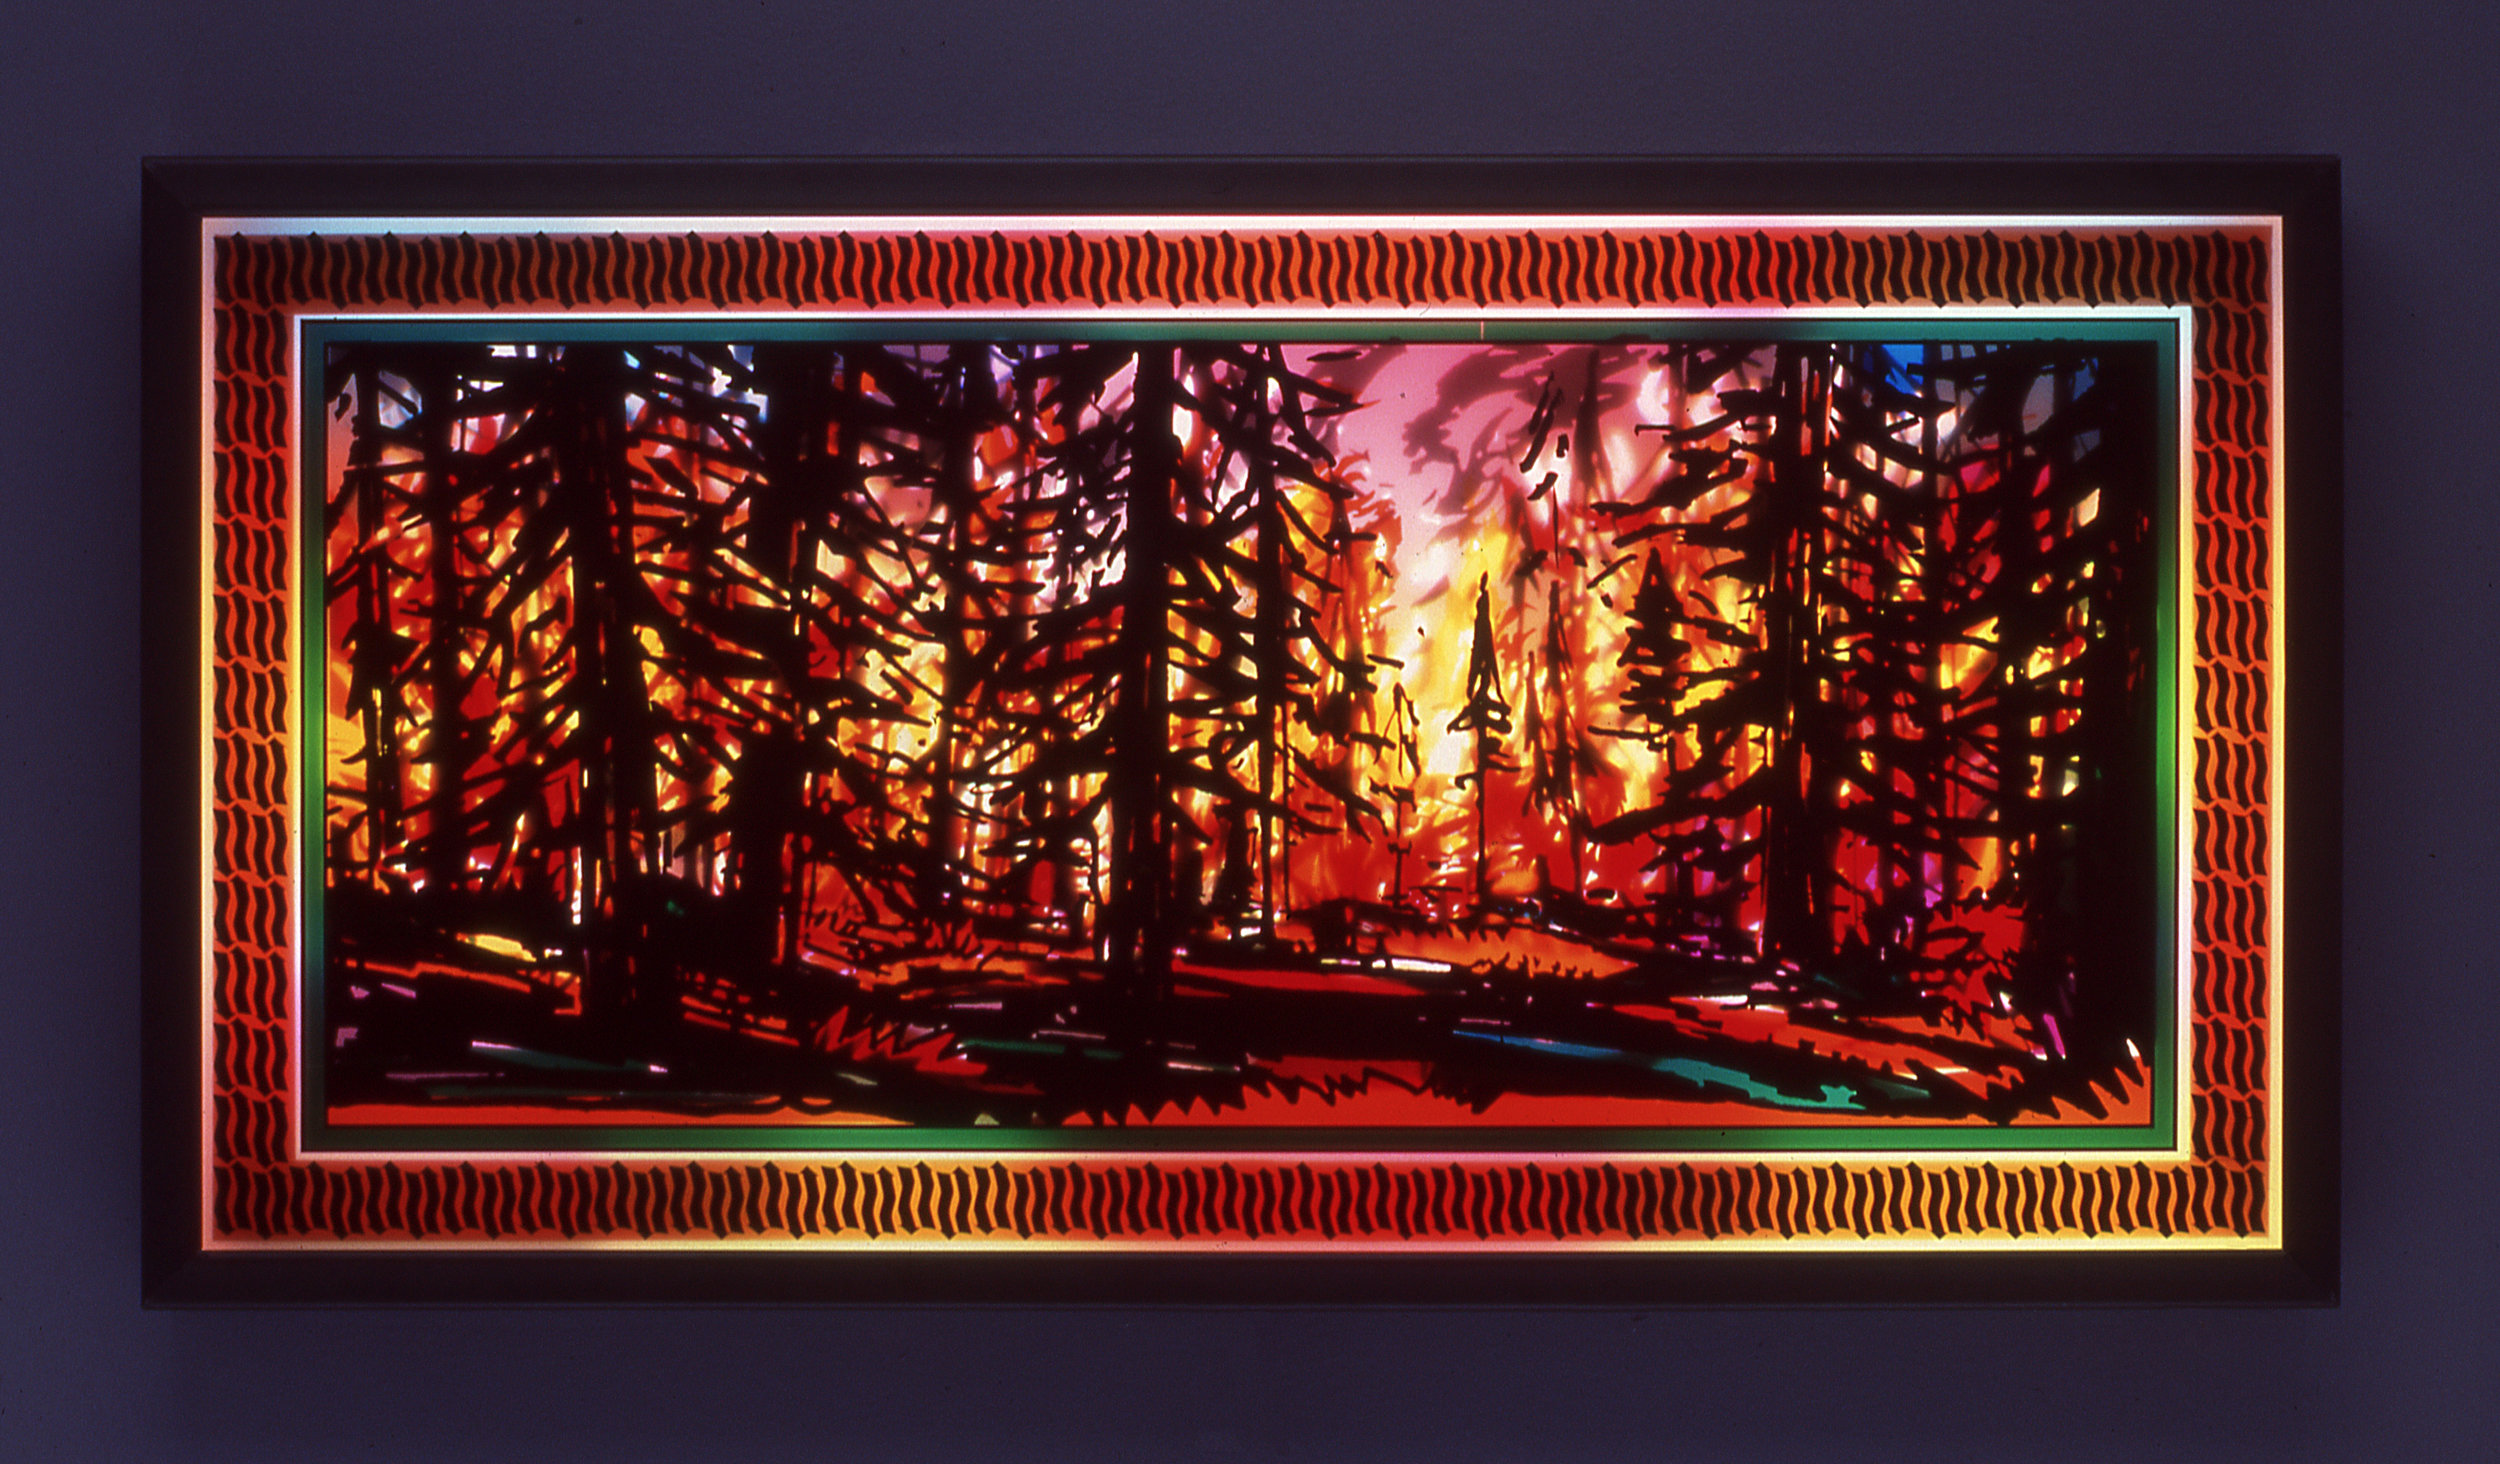 "Fire Box # 3, 2003  Transparent vinyl on plexi-glass, metal framed light-box  26"" x 50"" x 3 3/4"""